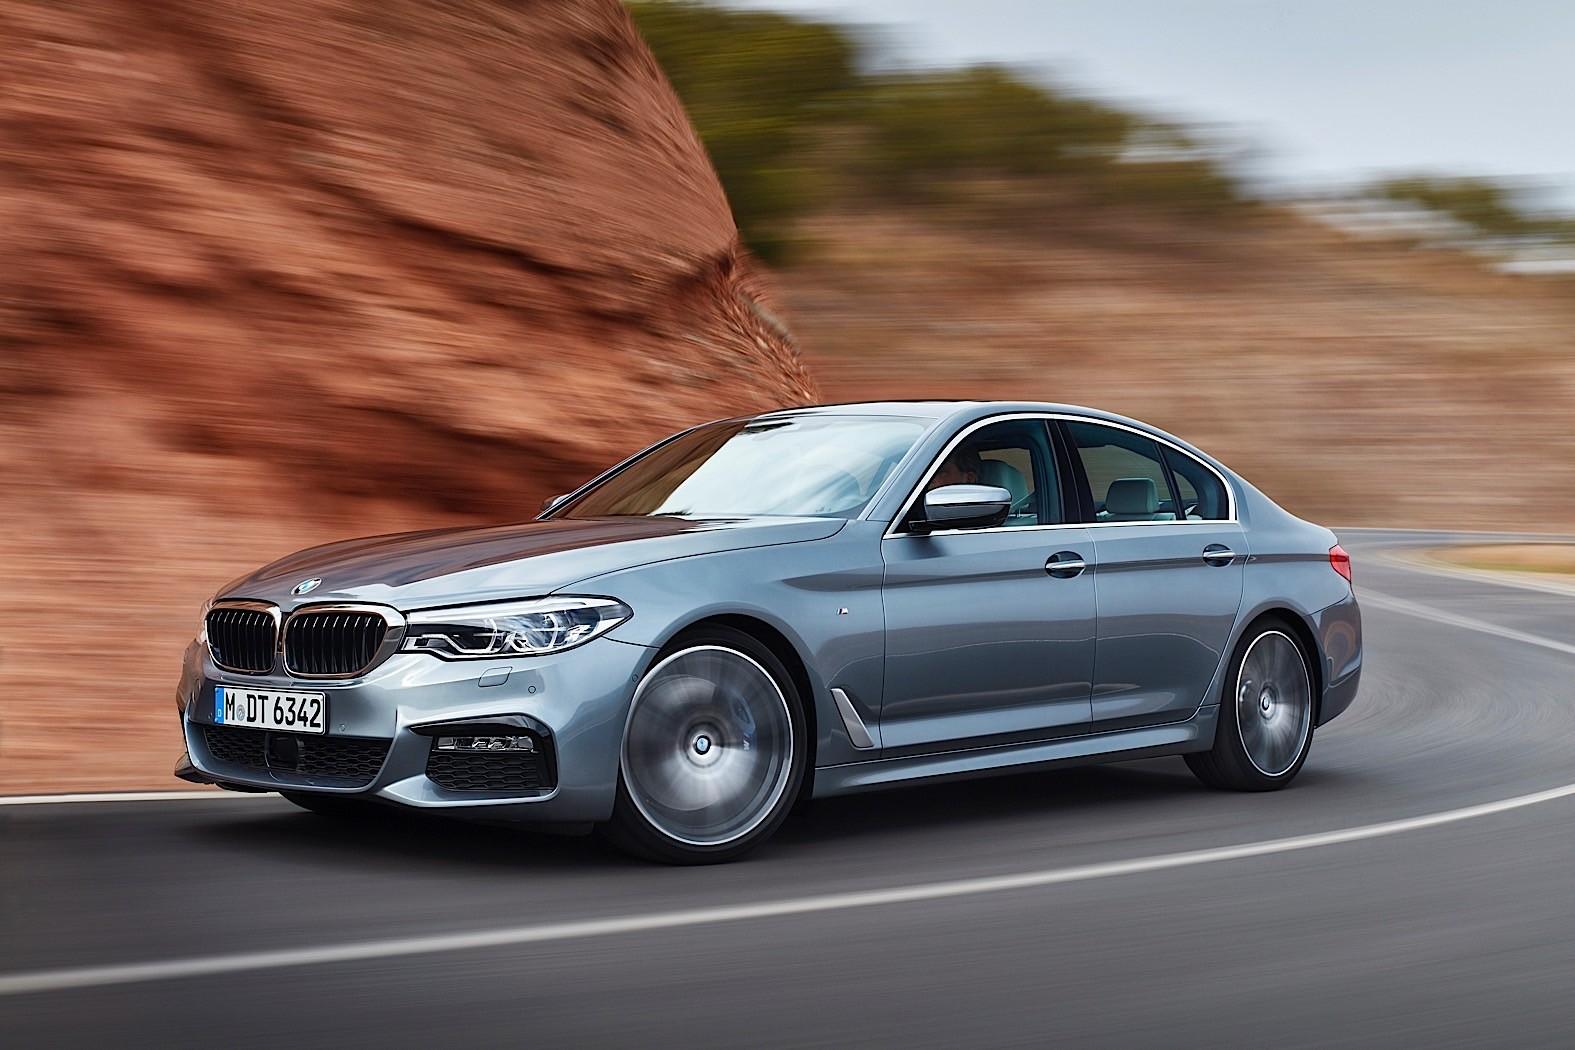 Bmw Key Evolution >> BMW G30 5 Series Goes Plug-In Hybrid: 2017 BMW 530e iPerformance - autoevolution